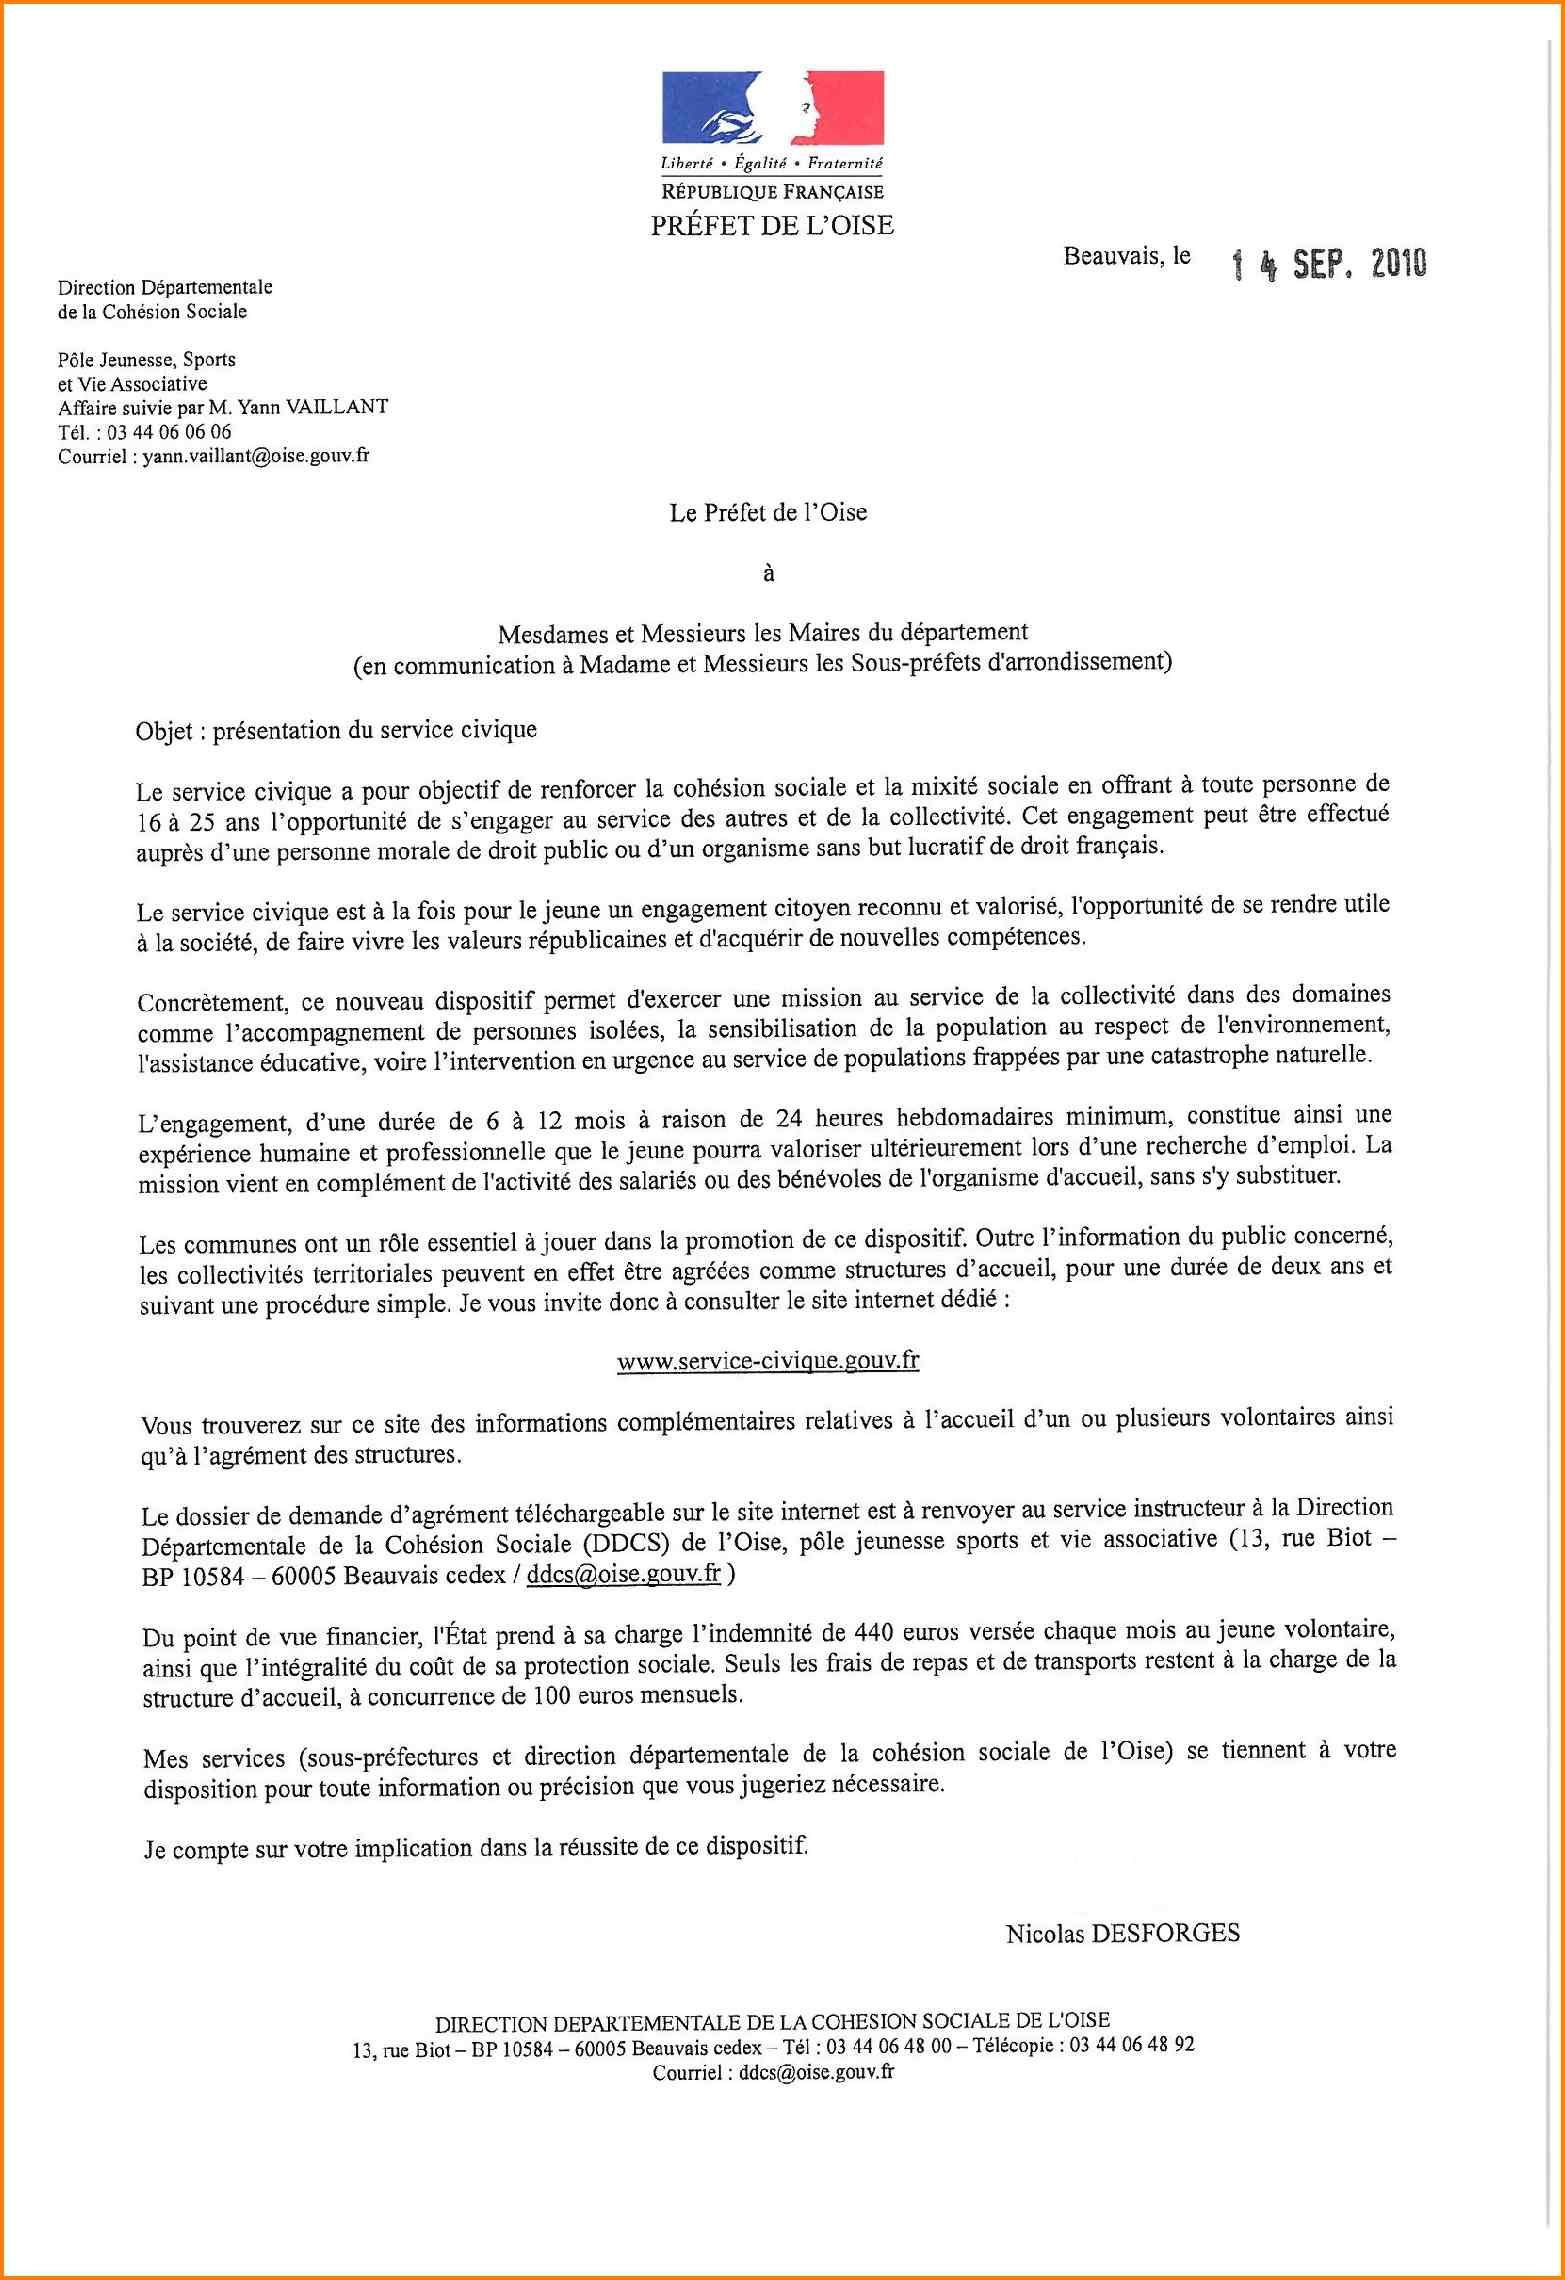 6 Exemple De Lettre Administrative Format Lettre Letter Example Cover Letter Example Teaching Cover Letter